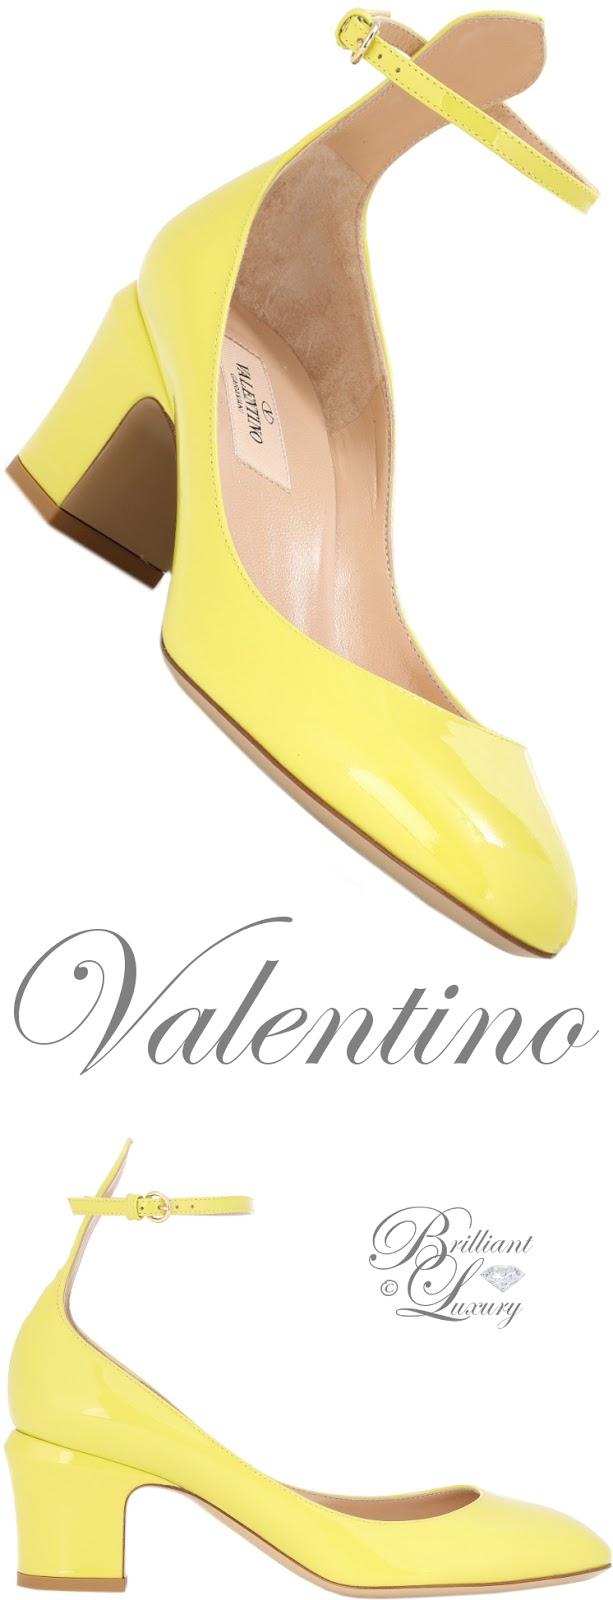 Brilliant Luxury ♦ Valentino Garavani Tango yellow leather pumps